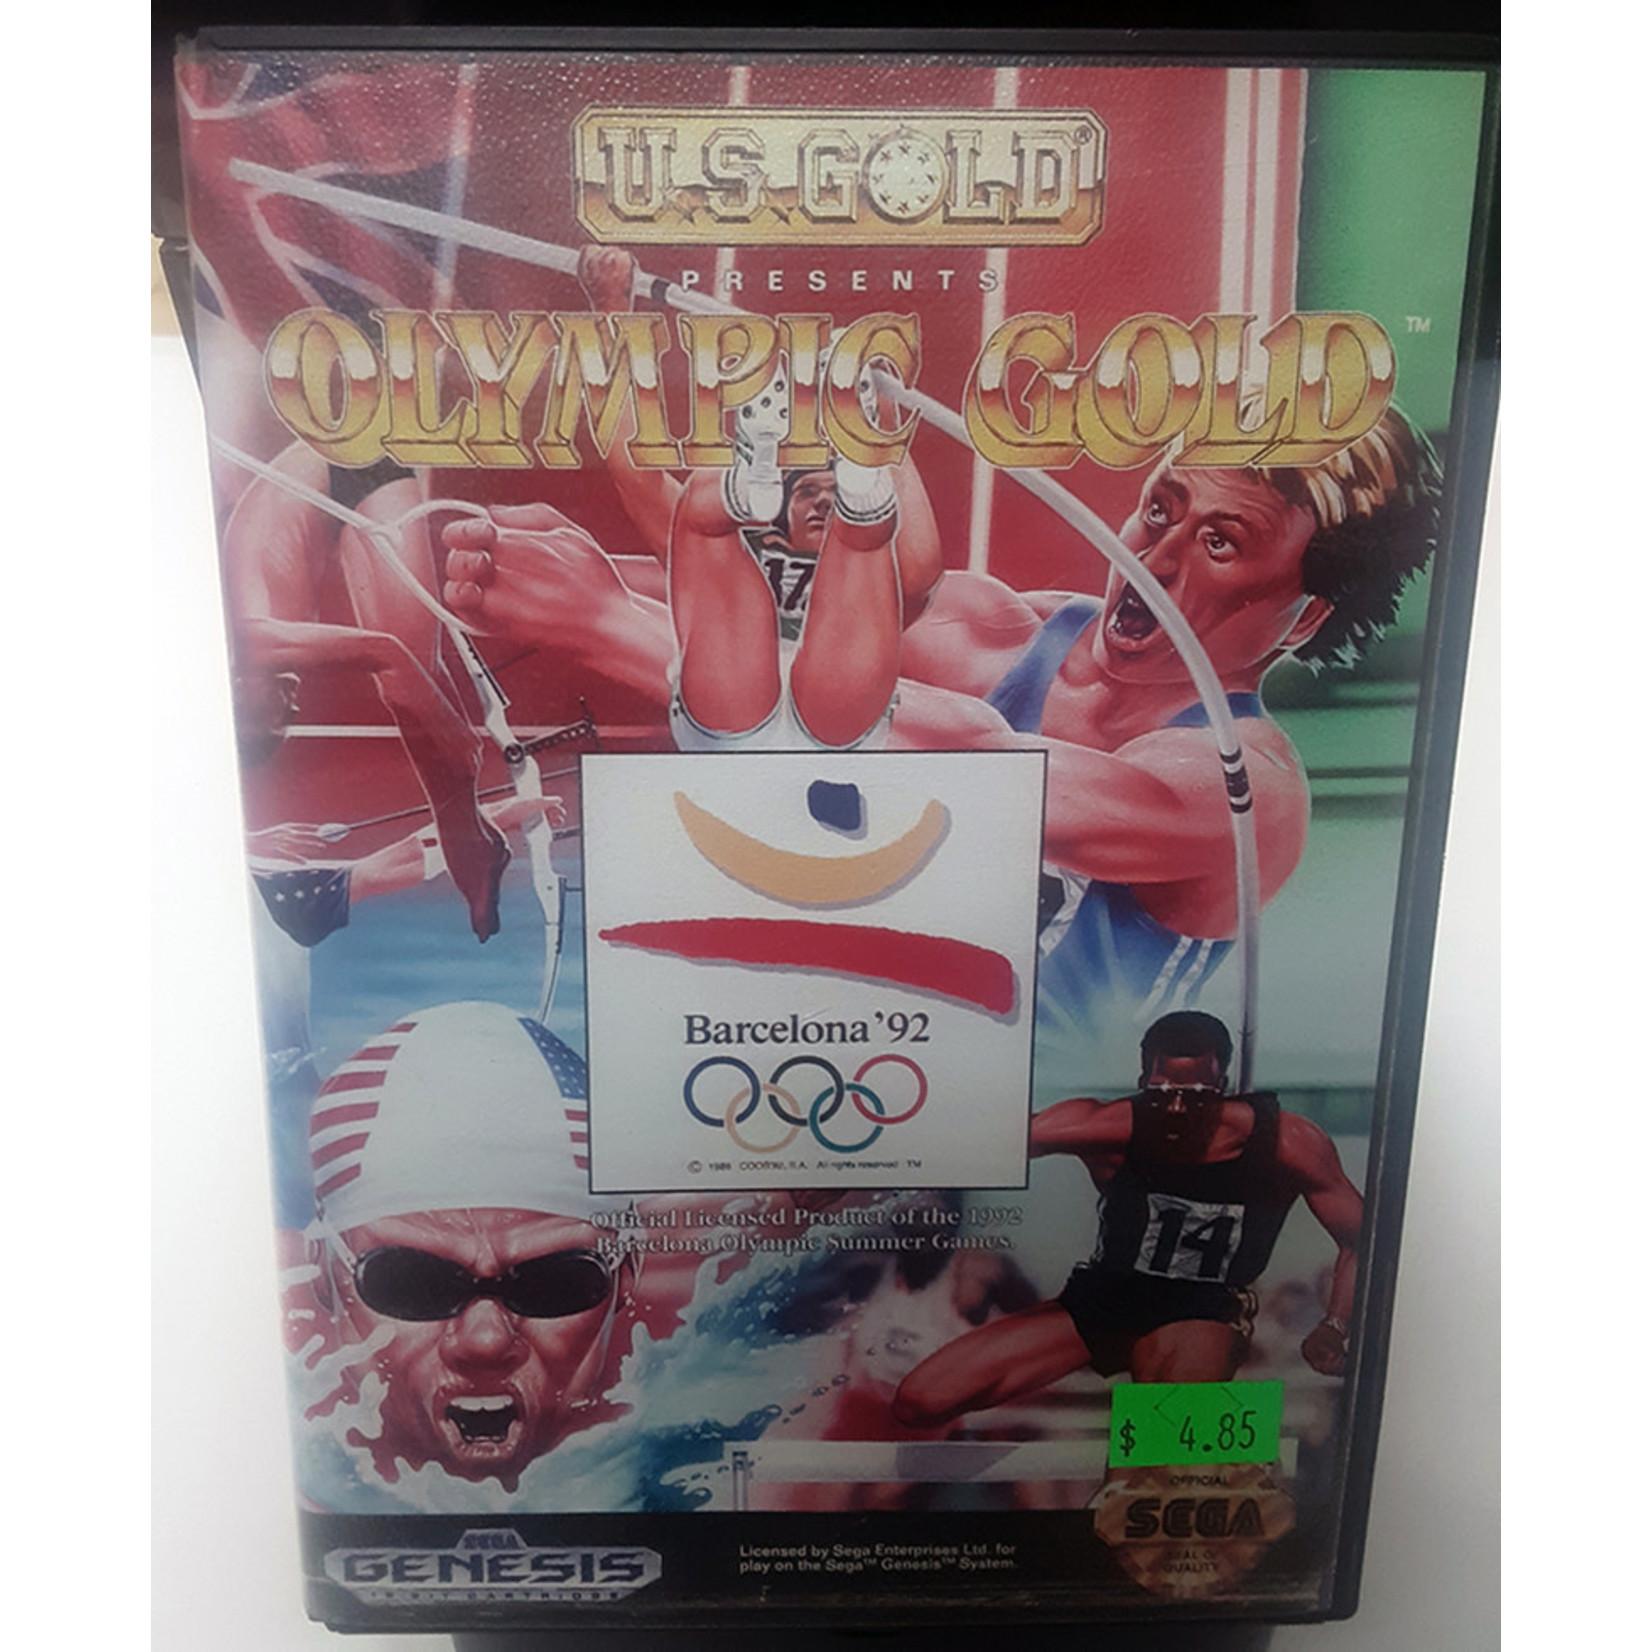 SGU-Olympic Gold Barcelona 92 (boxed)